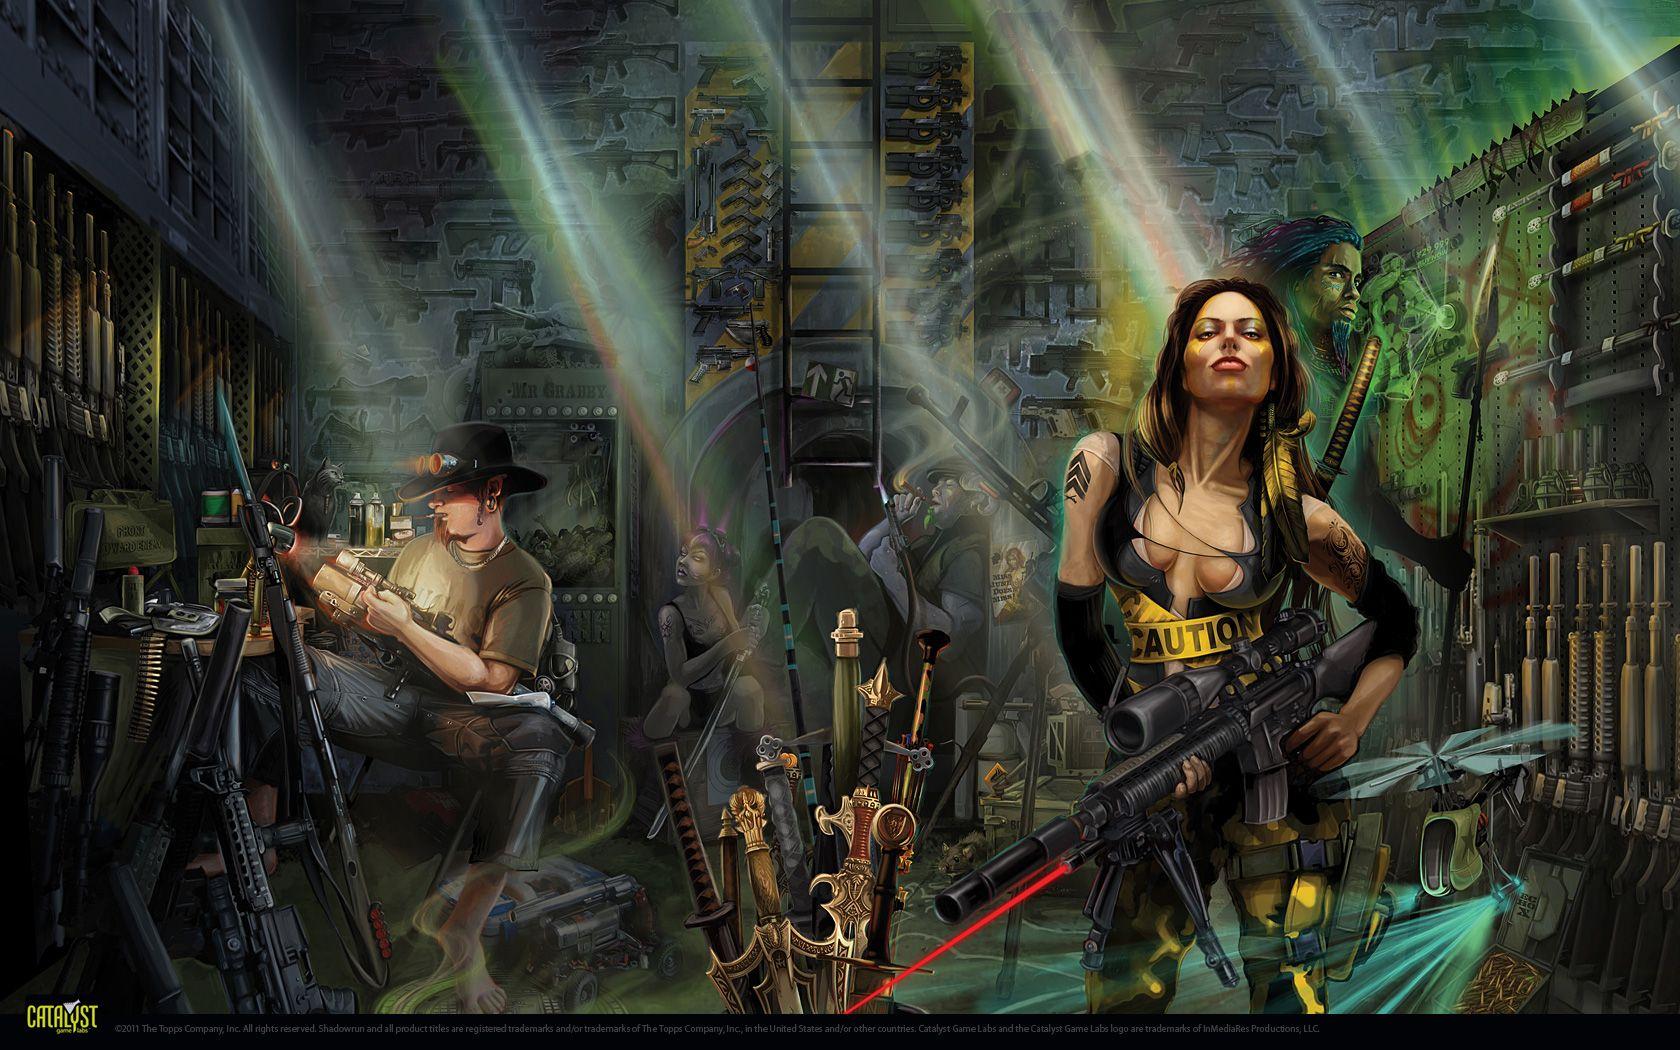 Pin By George Monson On Shadowrun Shadowrun Cyberpunk Cyberpunk Art